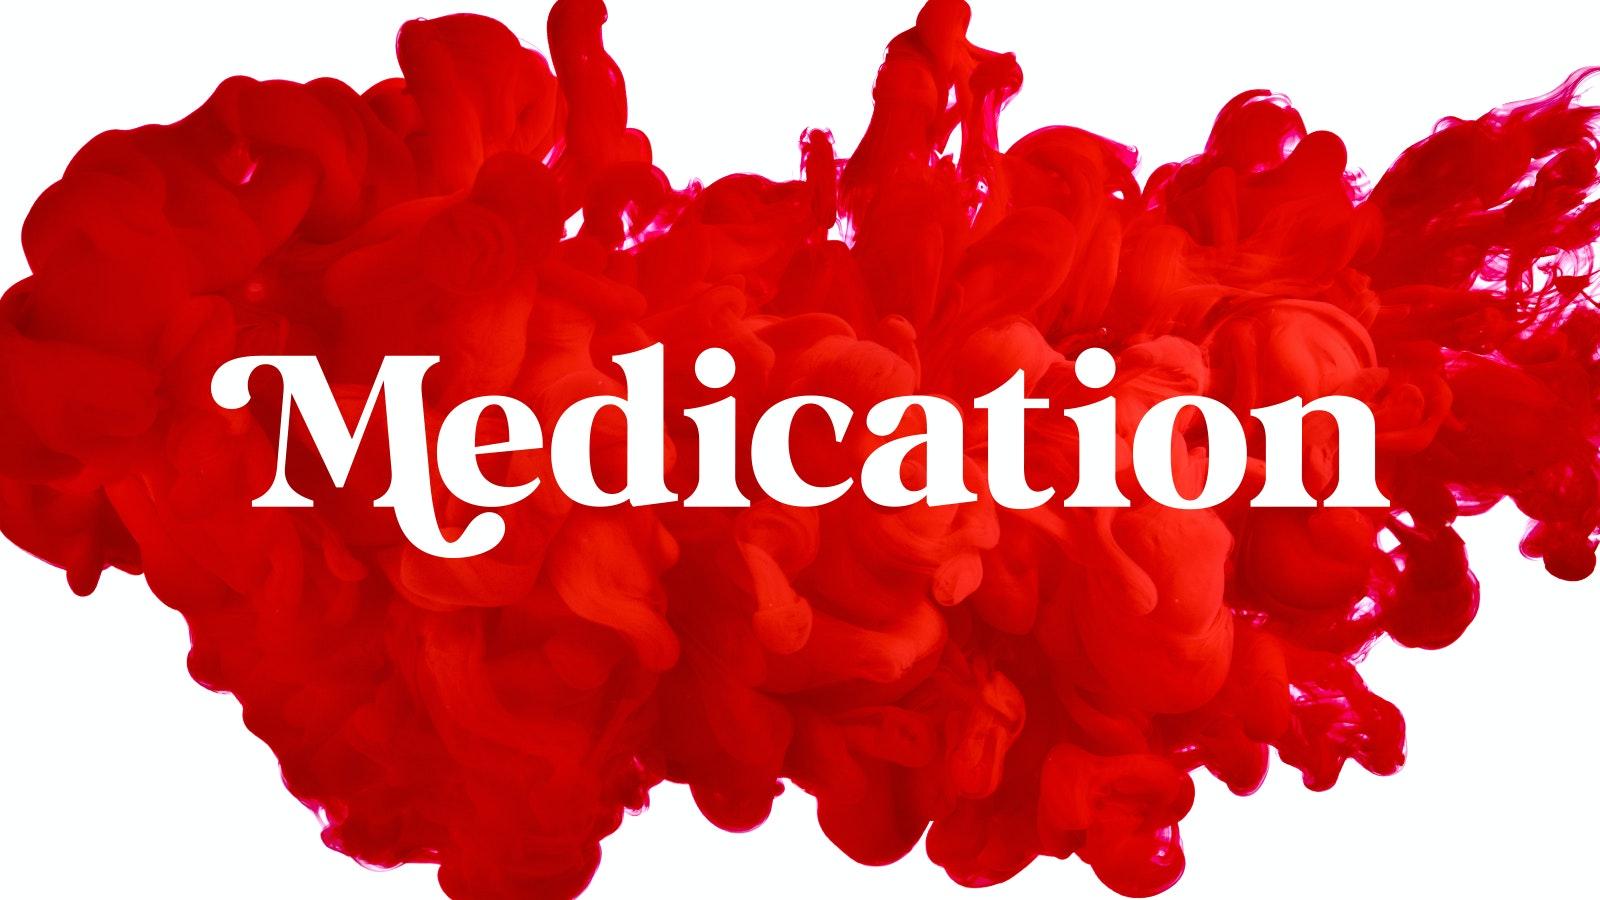 MEDICATION ULTRASOUND